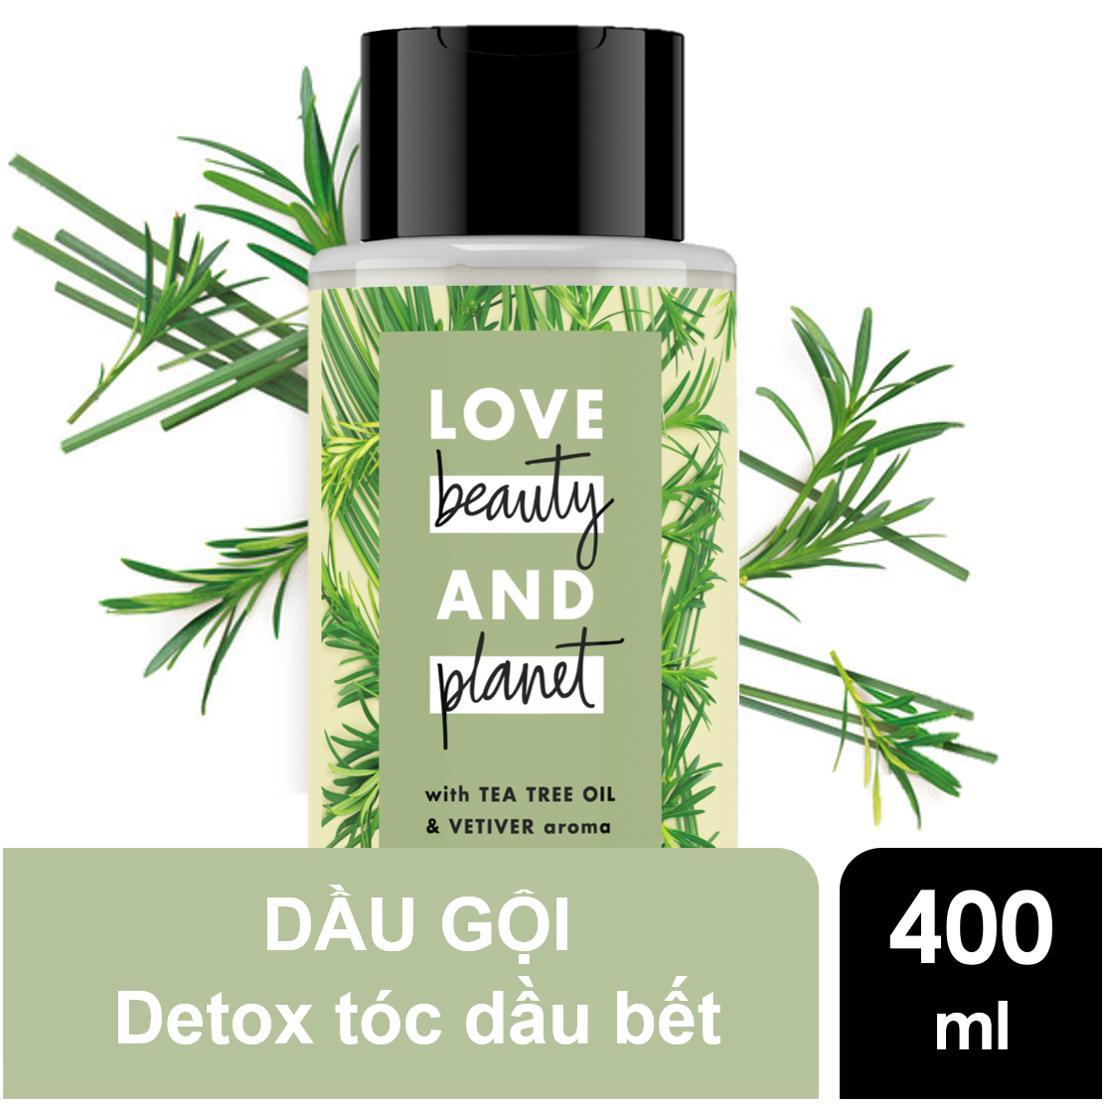 Dầu gội detox tóc Love Beauty And Planet Radical Refresher 400ml